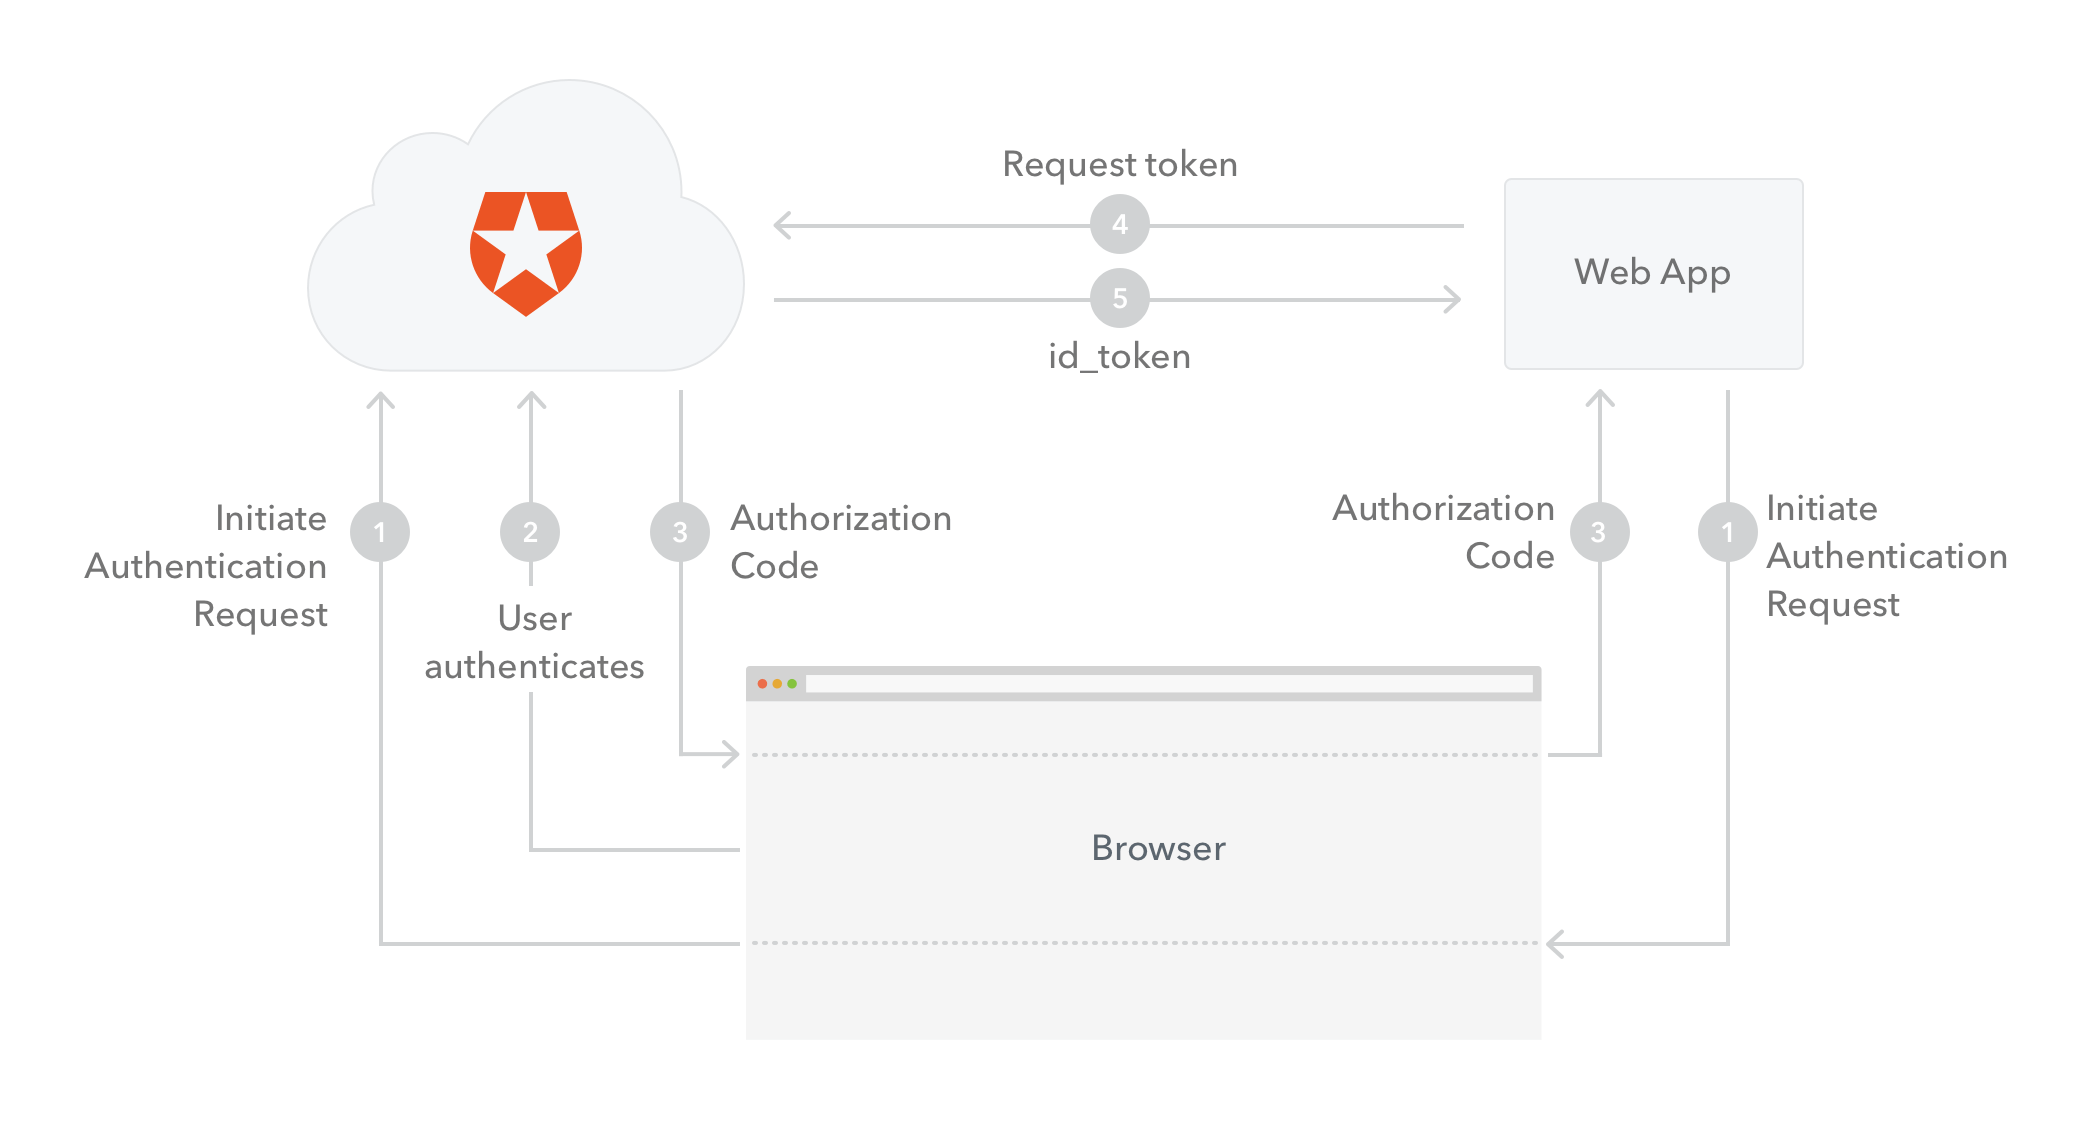 Diagram of the Authorization Code Flow